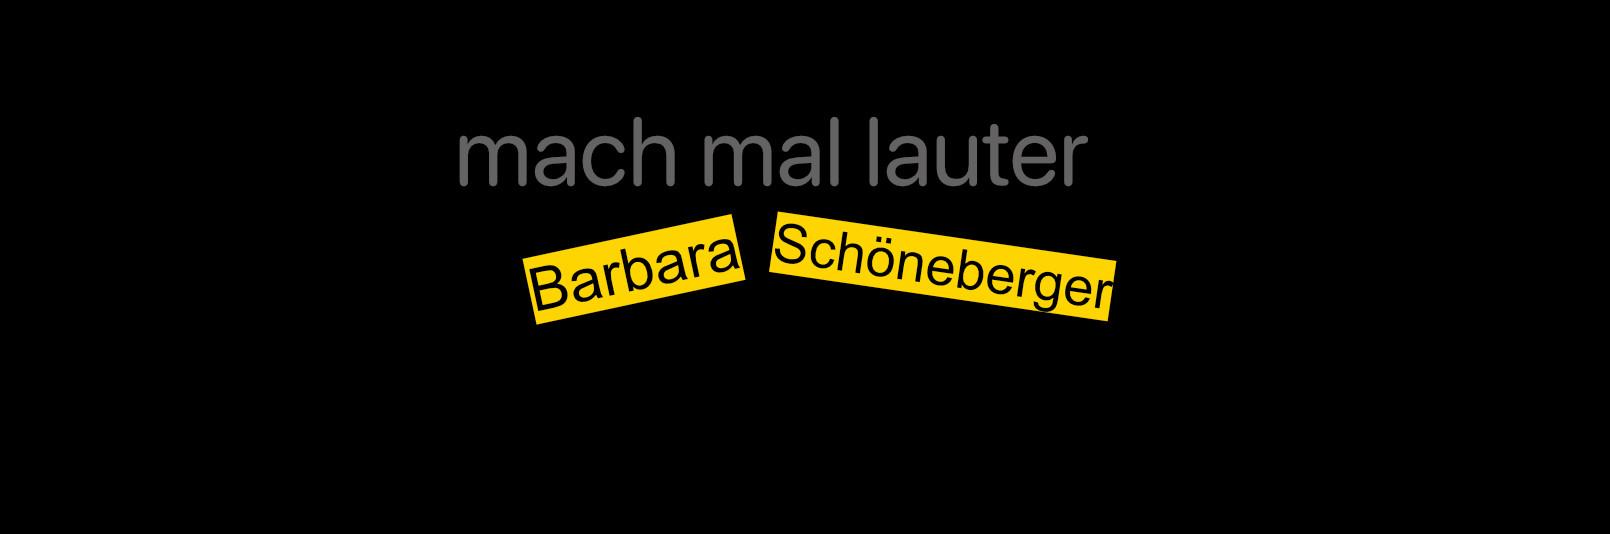 Barbara Schöneberger hat Morten Harket immer noch tief im Herzen